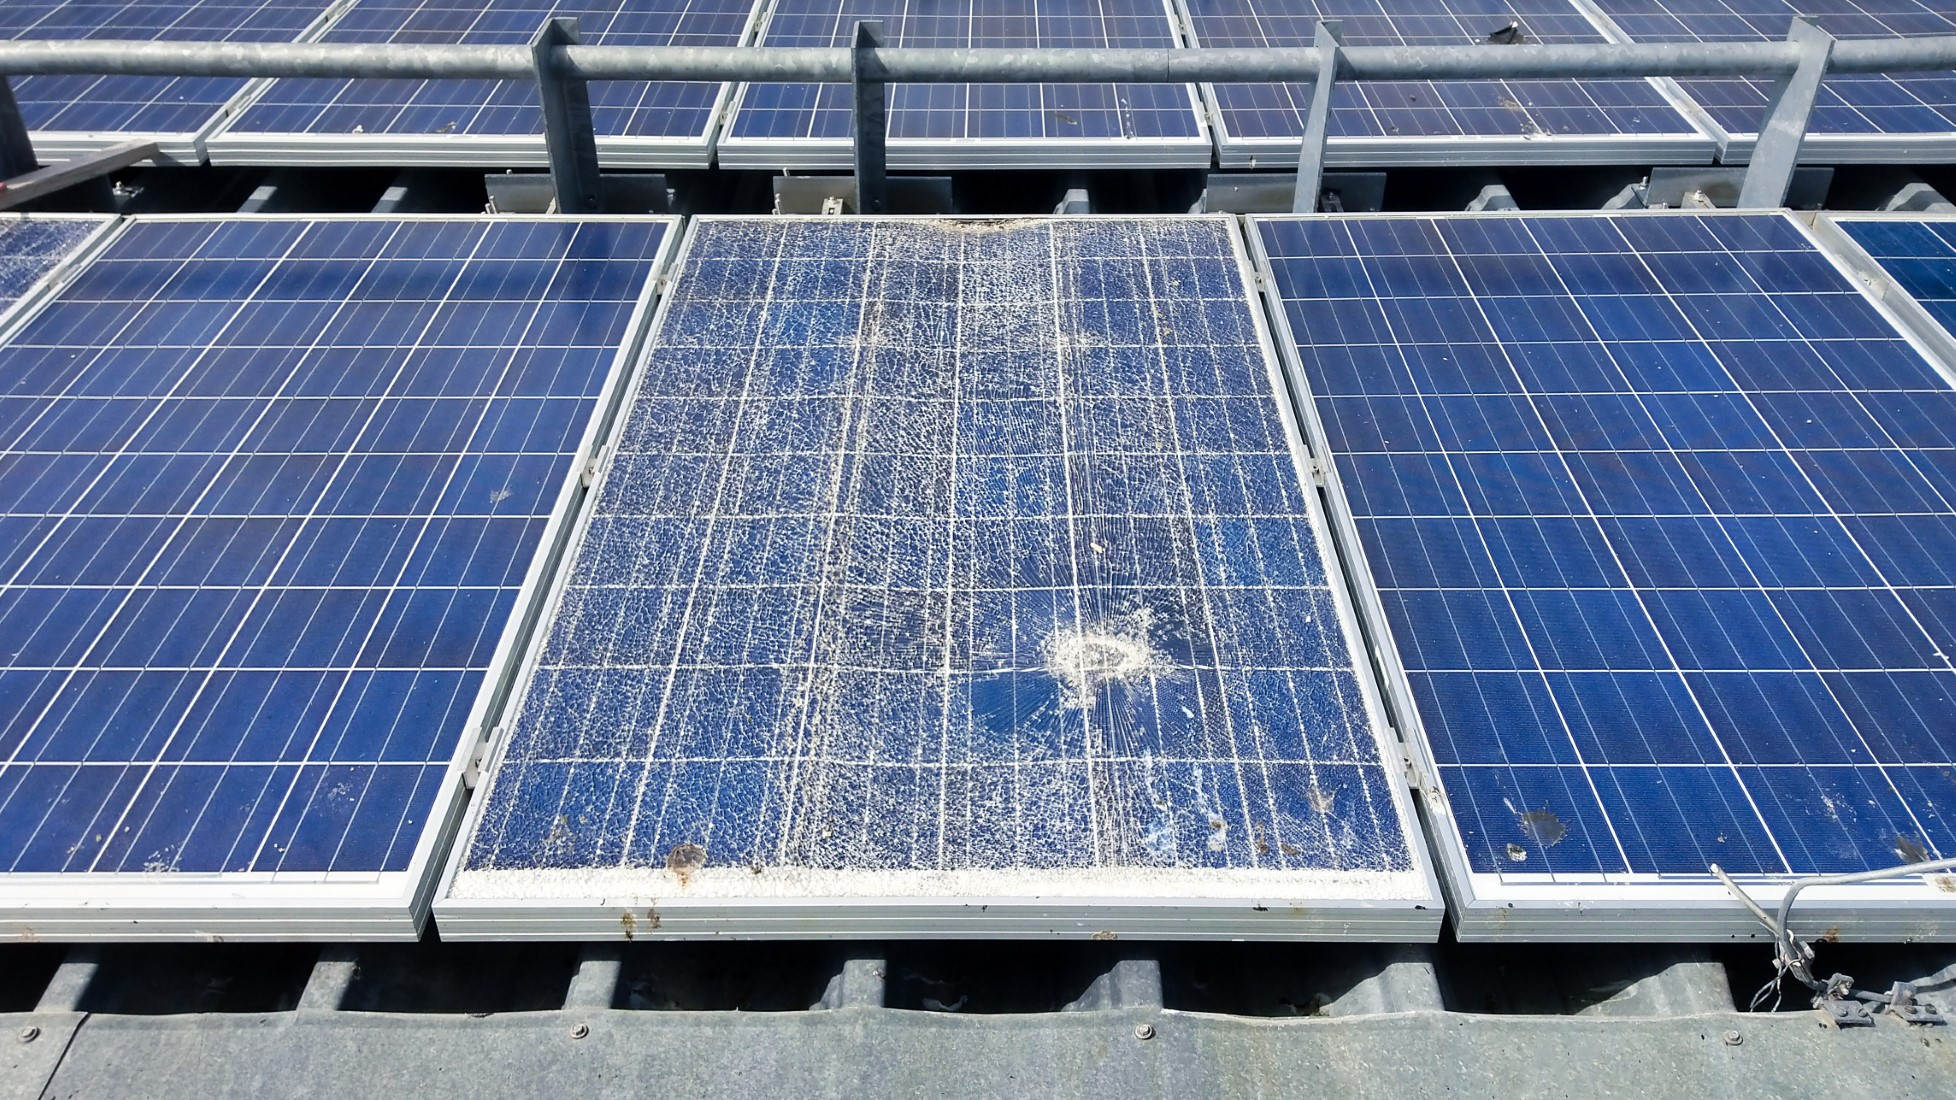 Photovoltaikgarantie